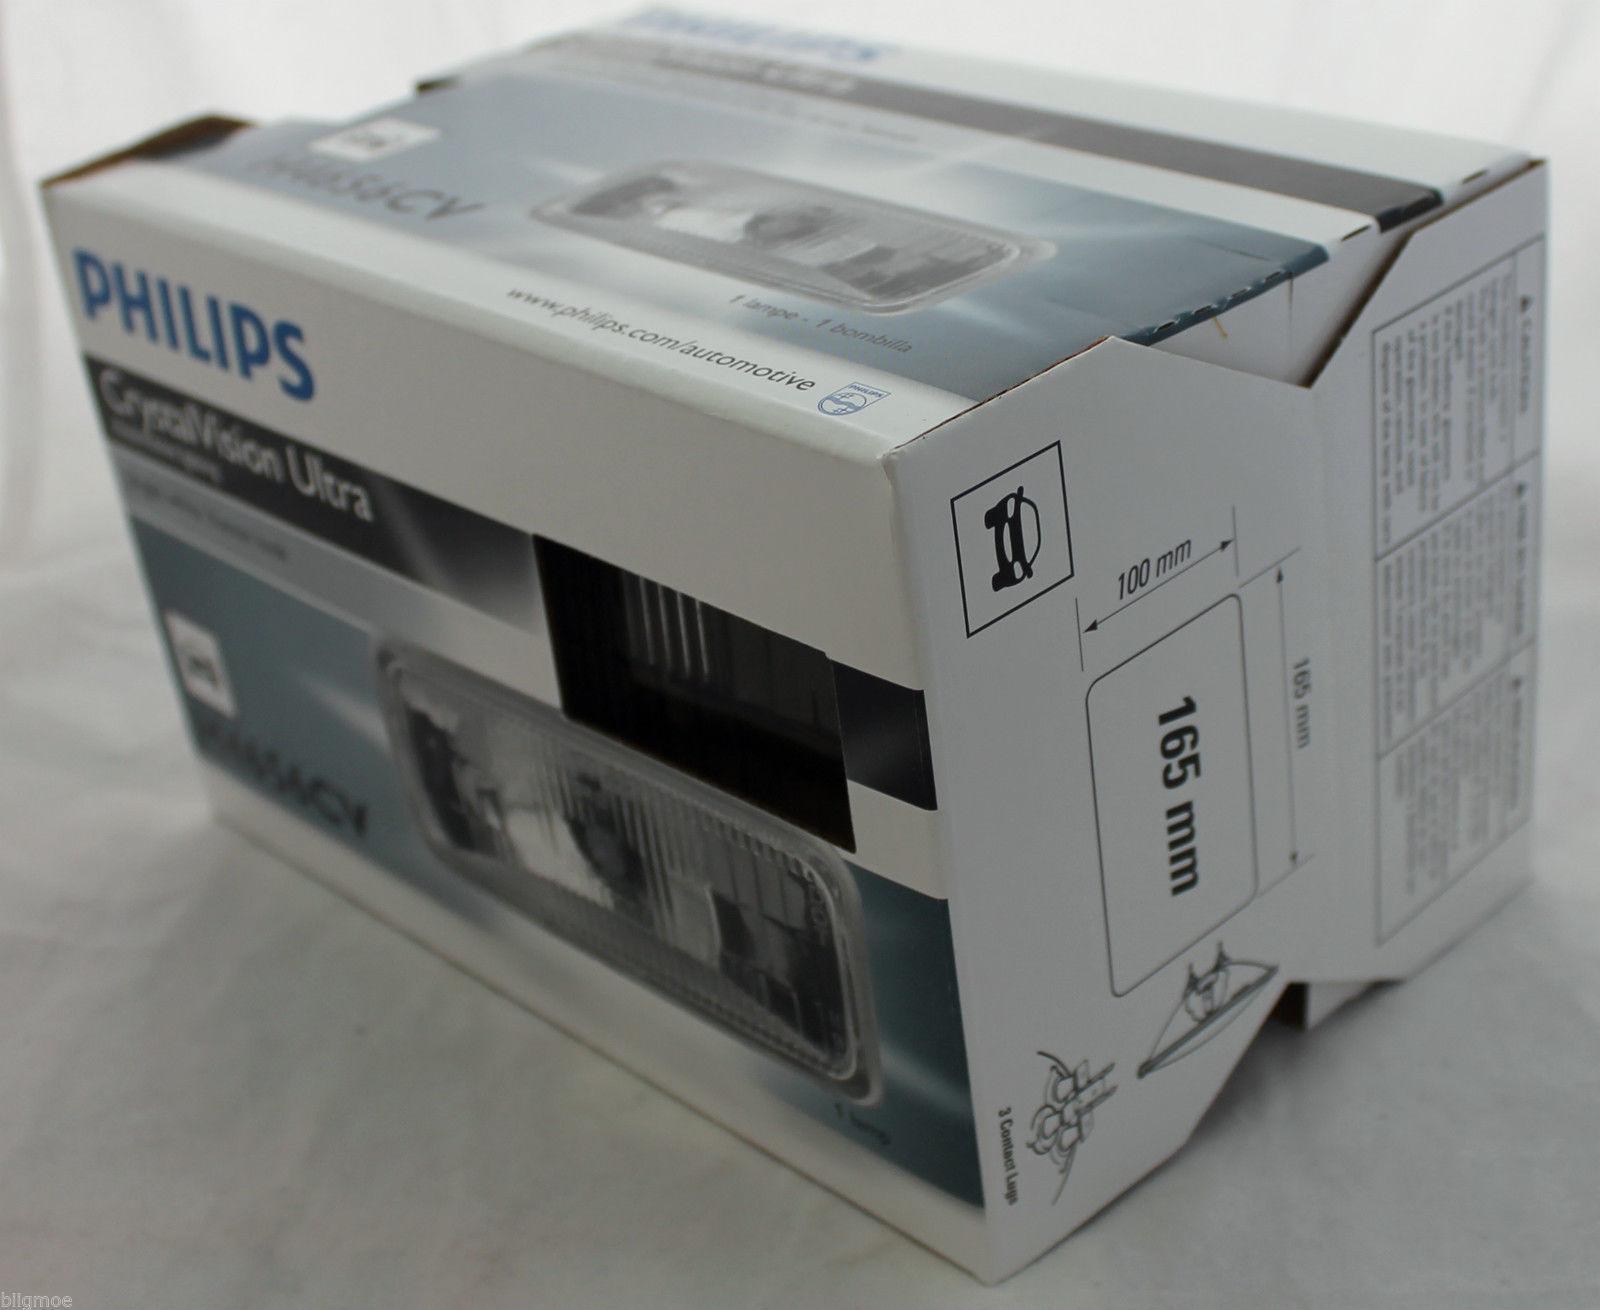 NEW PHILIPS CRYSTAL VISION ULTRA HALOGEN HEADLIGHT H4656CV 12V BRIGHT XENON LAMP